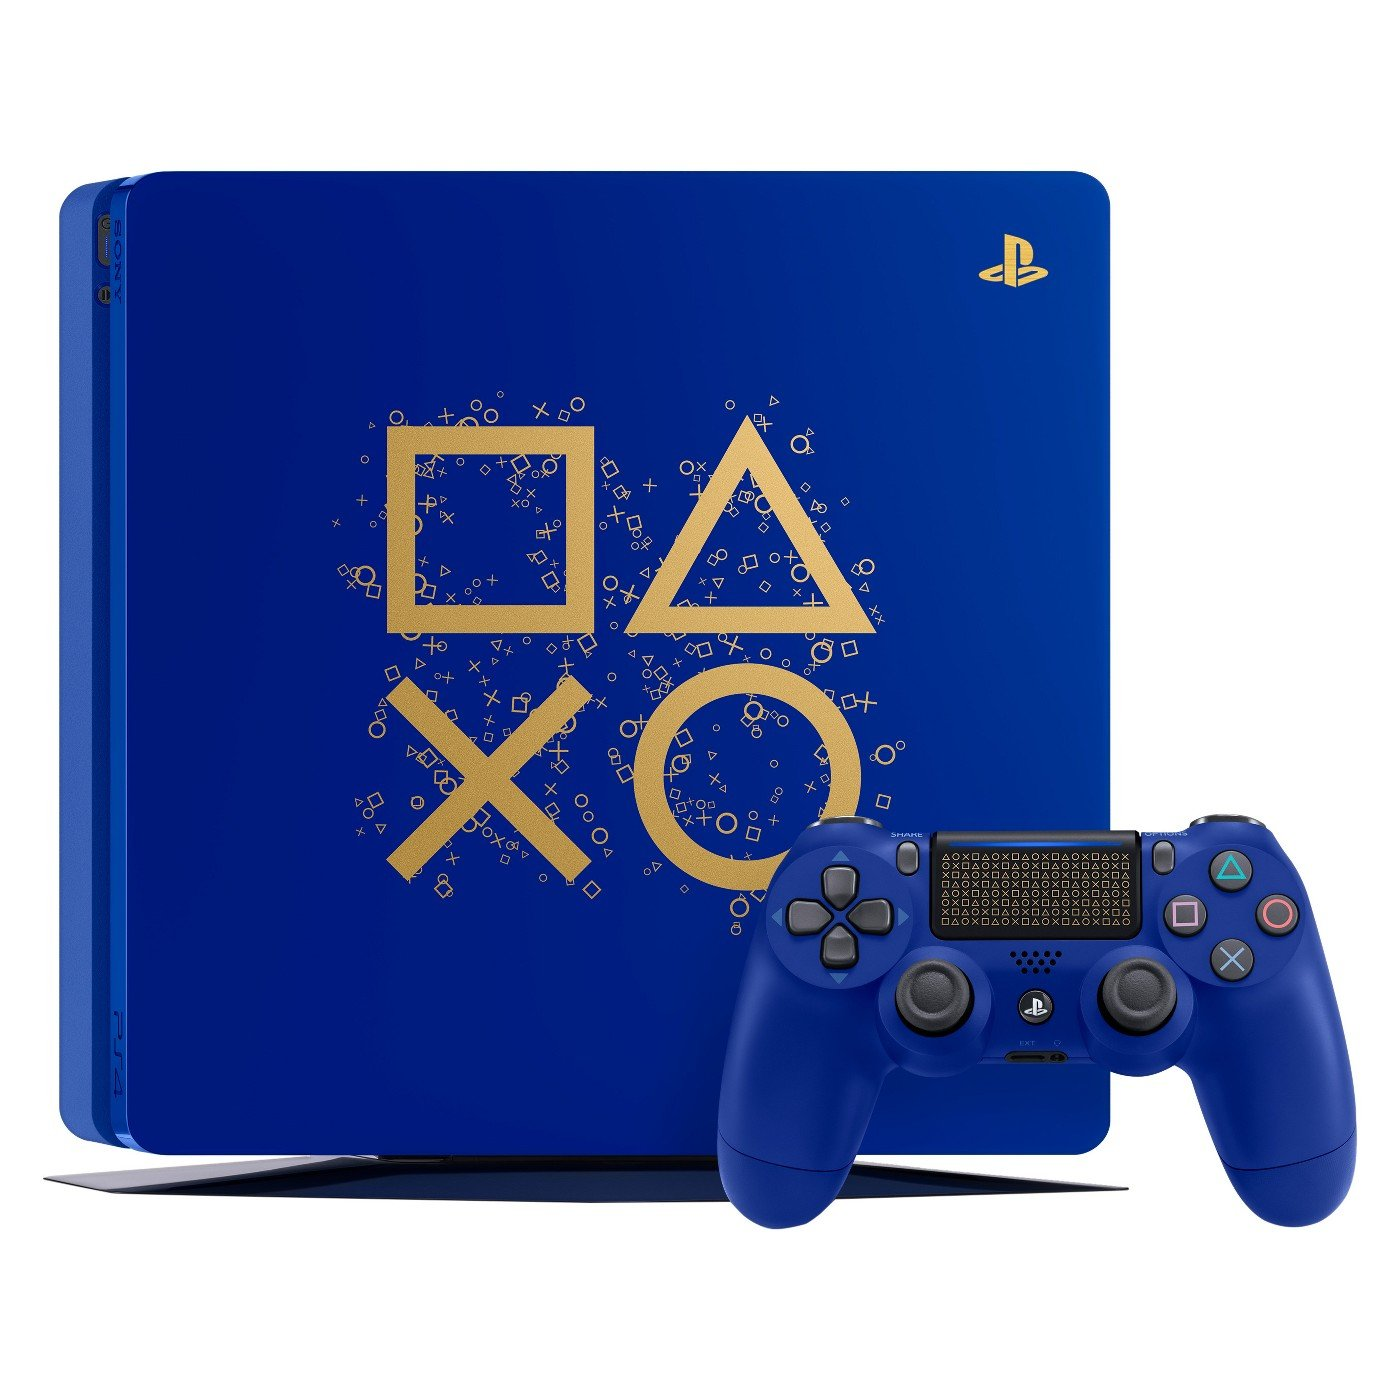 PlayStation 4 Slim 1TB Limited Edition Colorado Springs Mall - Days of Bu Console Play Save money